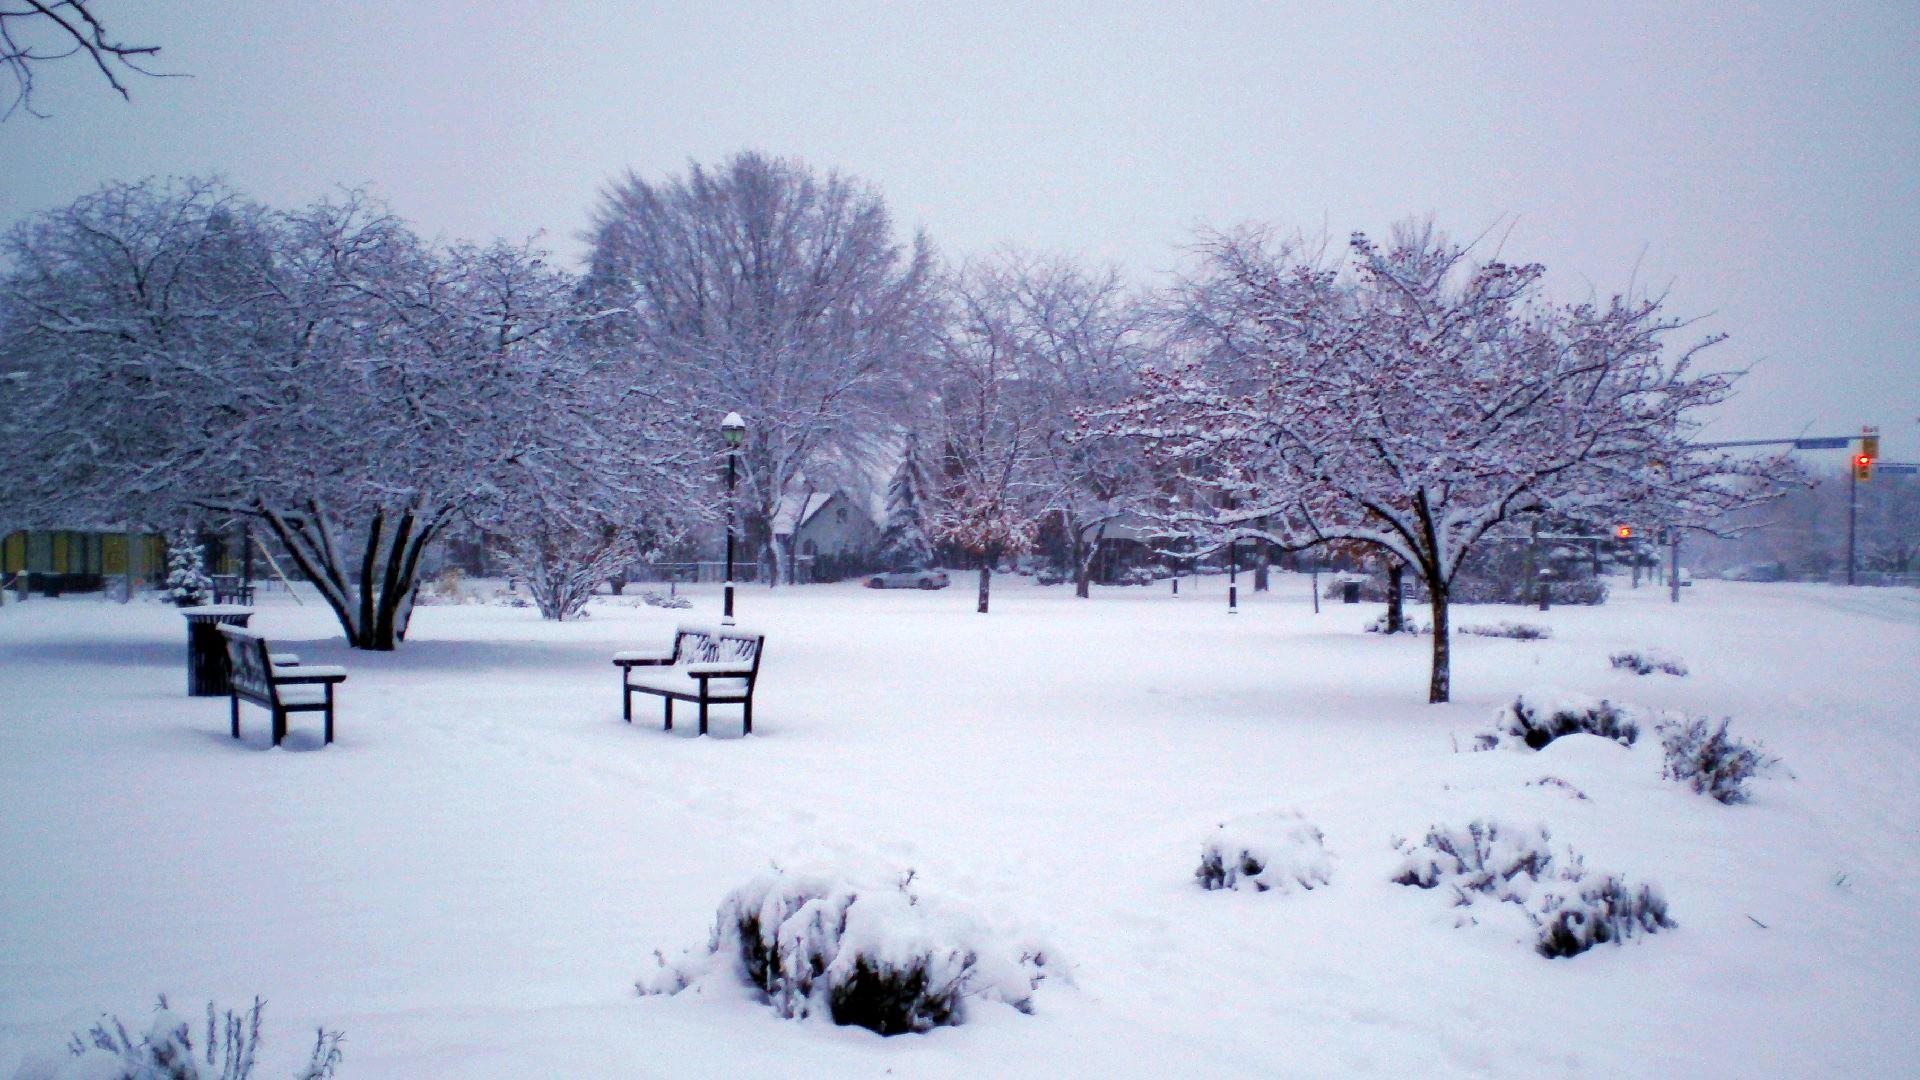 A park in Kelowna, BC, Canada, after a snowfall.